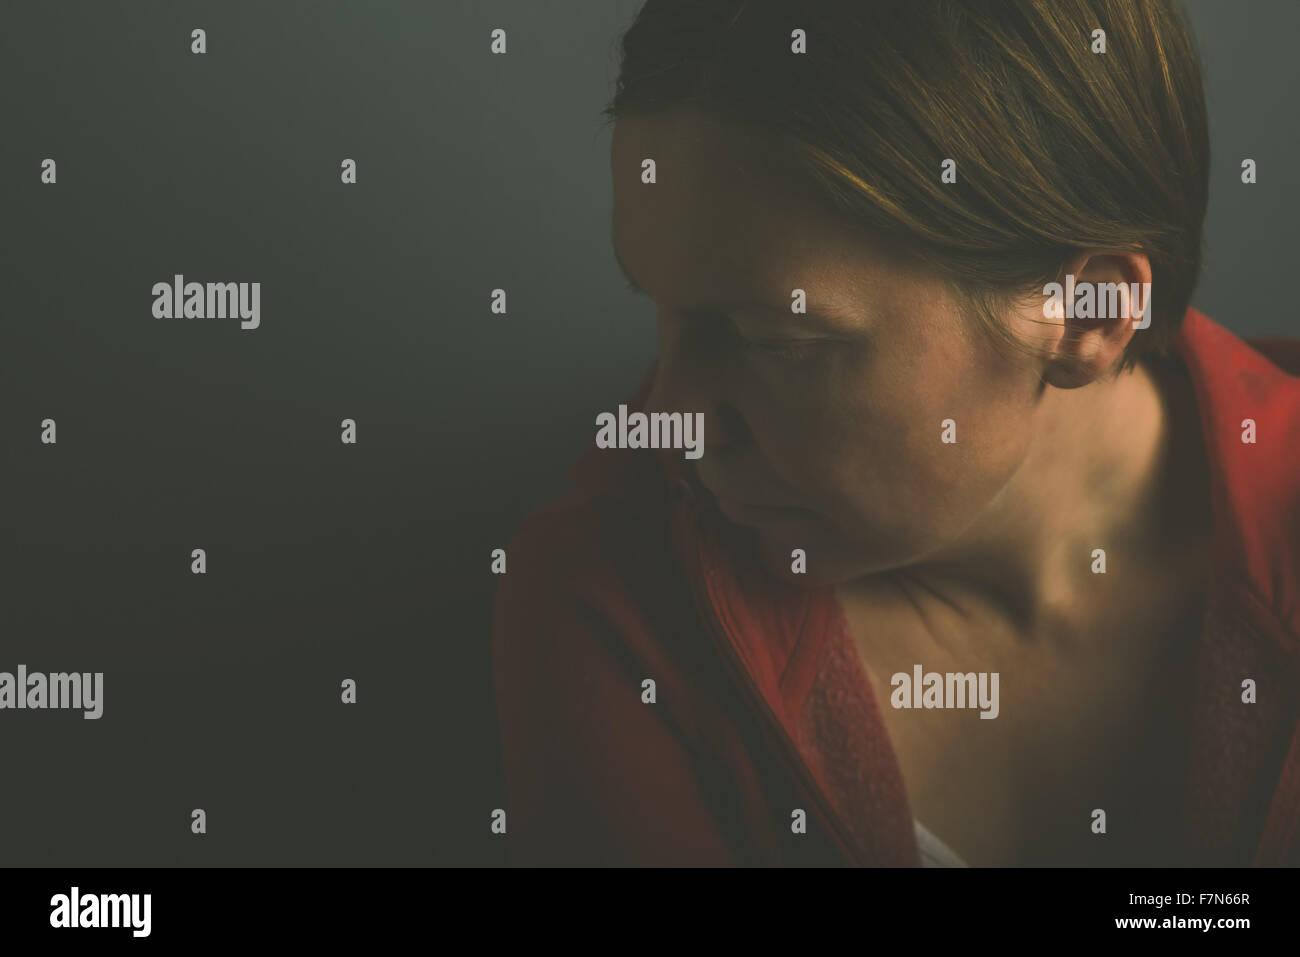 Depressive pessimistic lonely woman in dark room, low key portrait of sad adult female - Stock Image